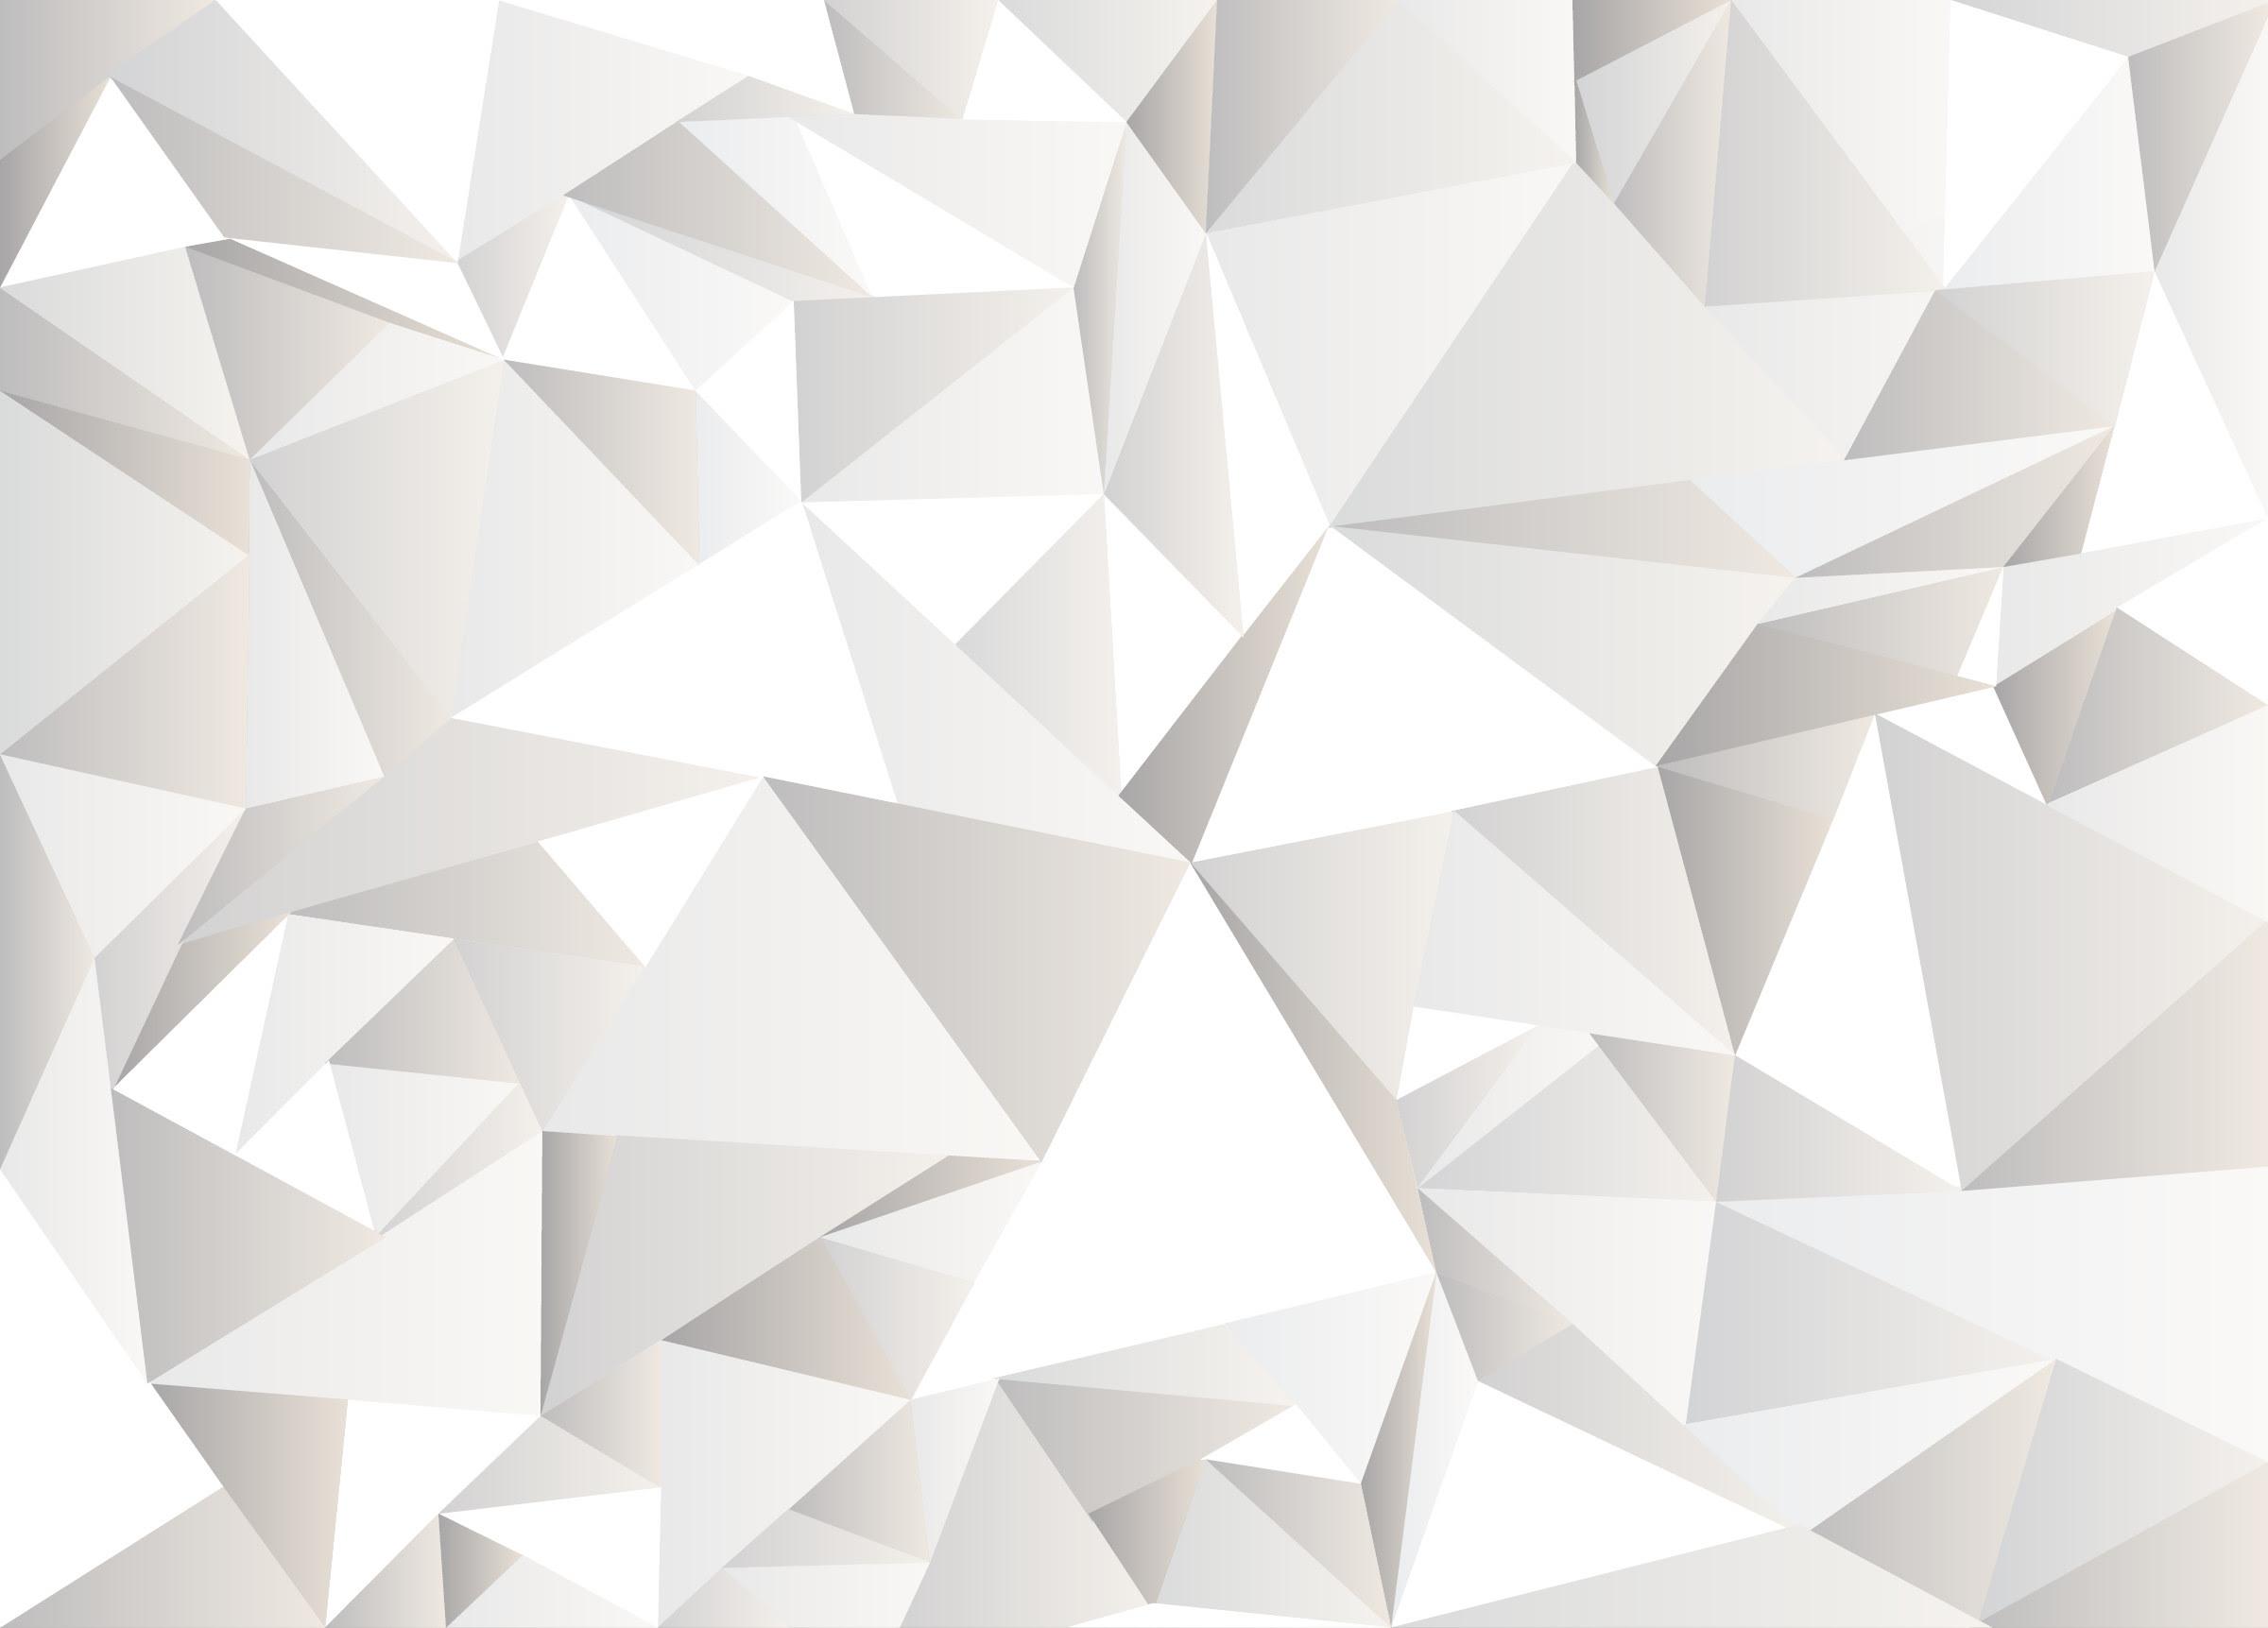 Download 960 Koleksi Background Putih Abstrak Gratis Terbaru